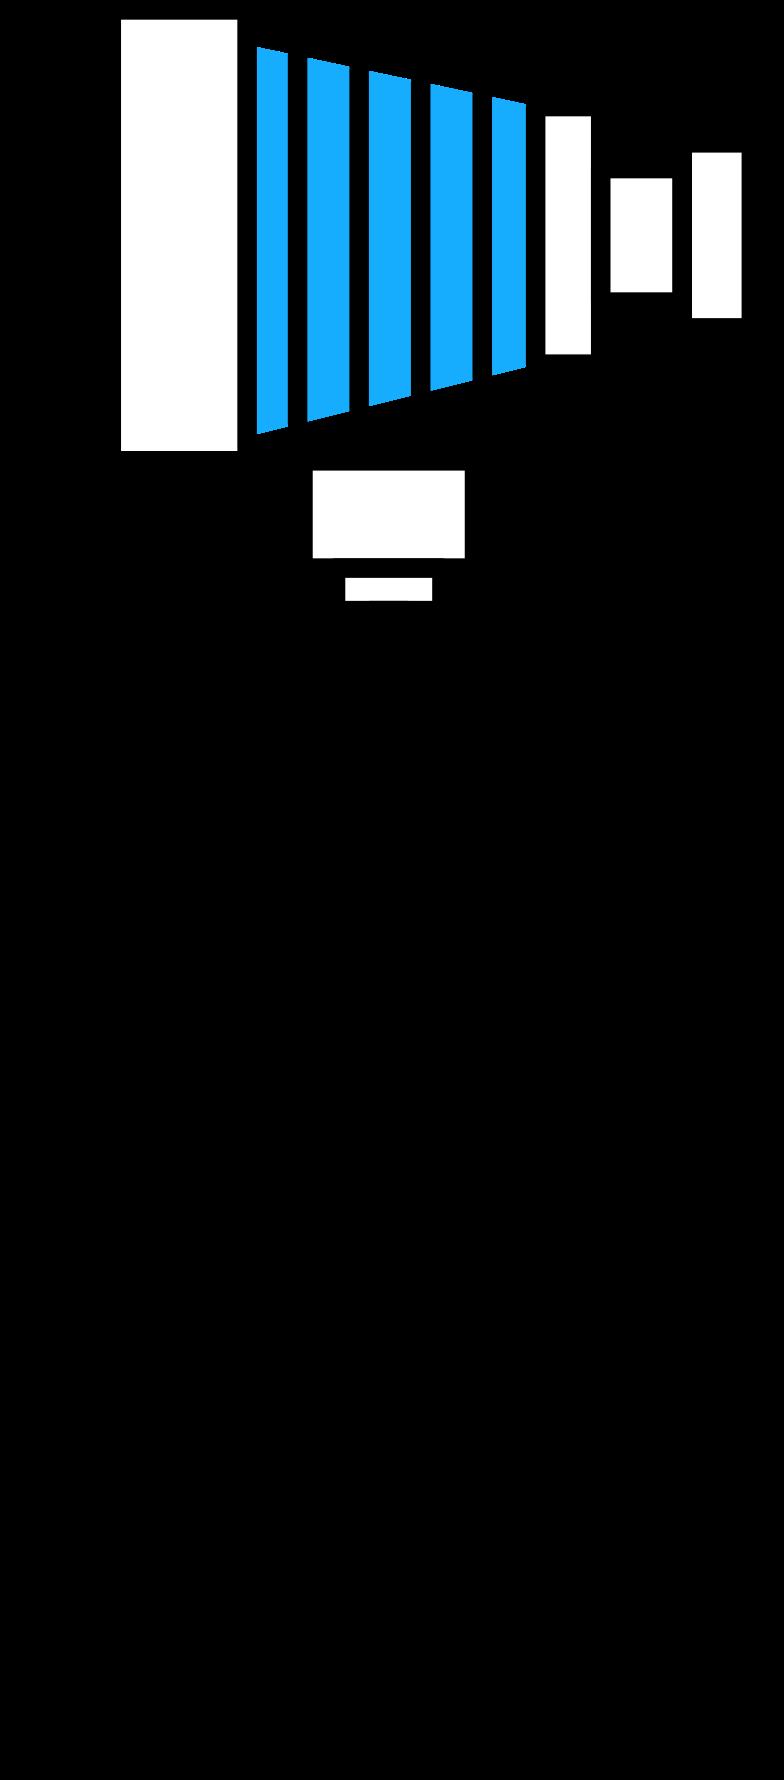 old camera Clipart illustration in PNG, SVG